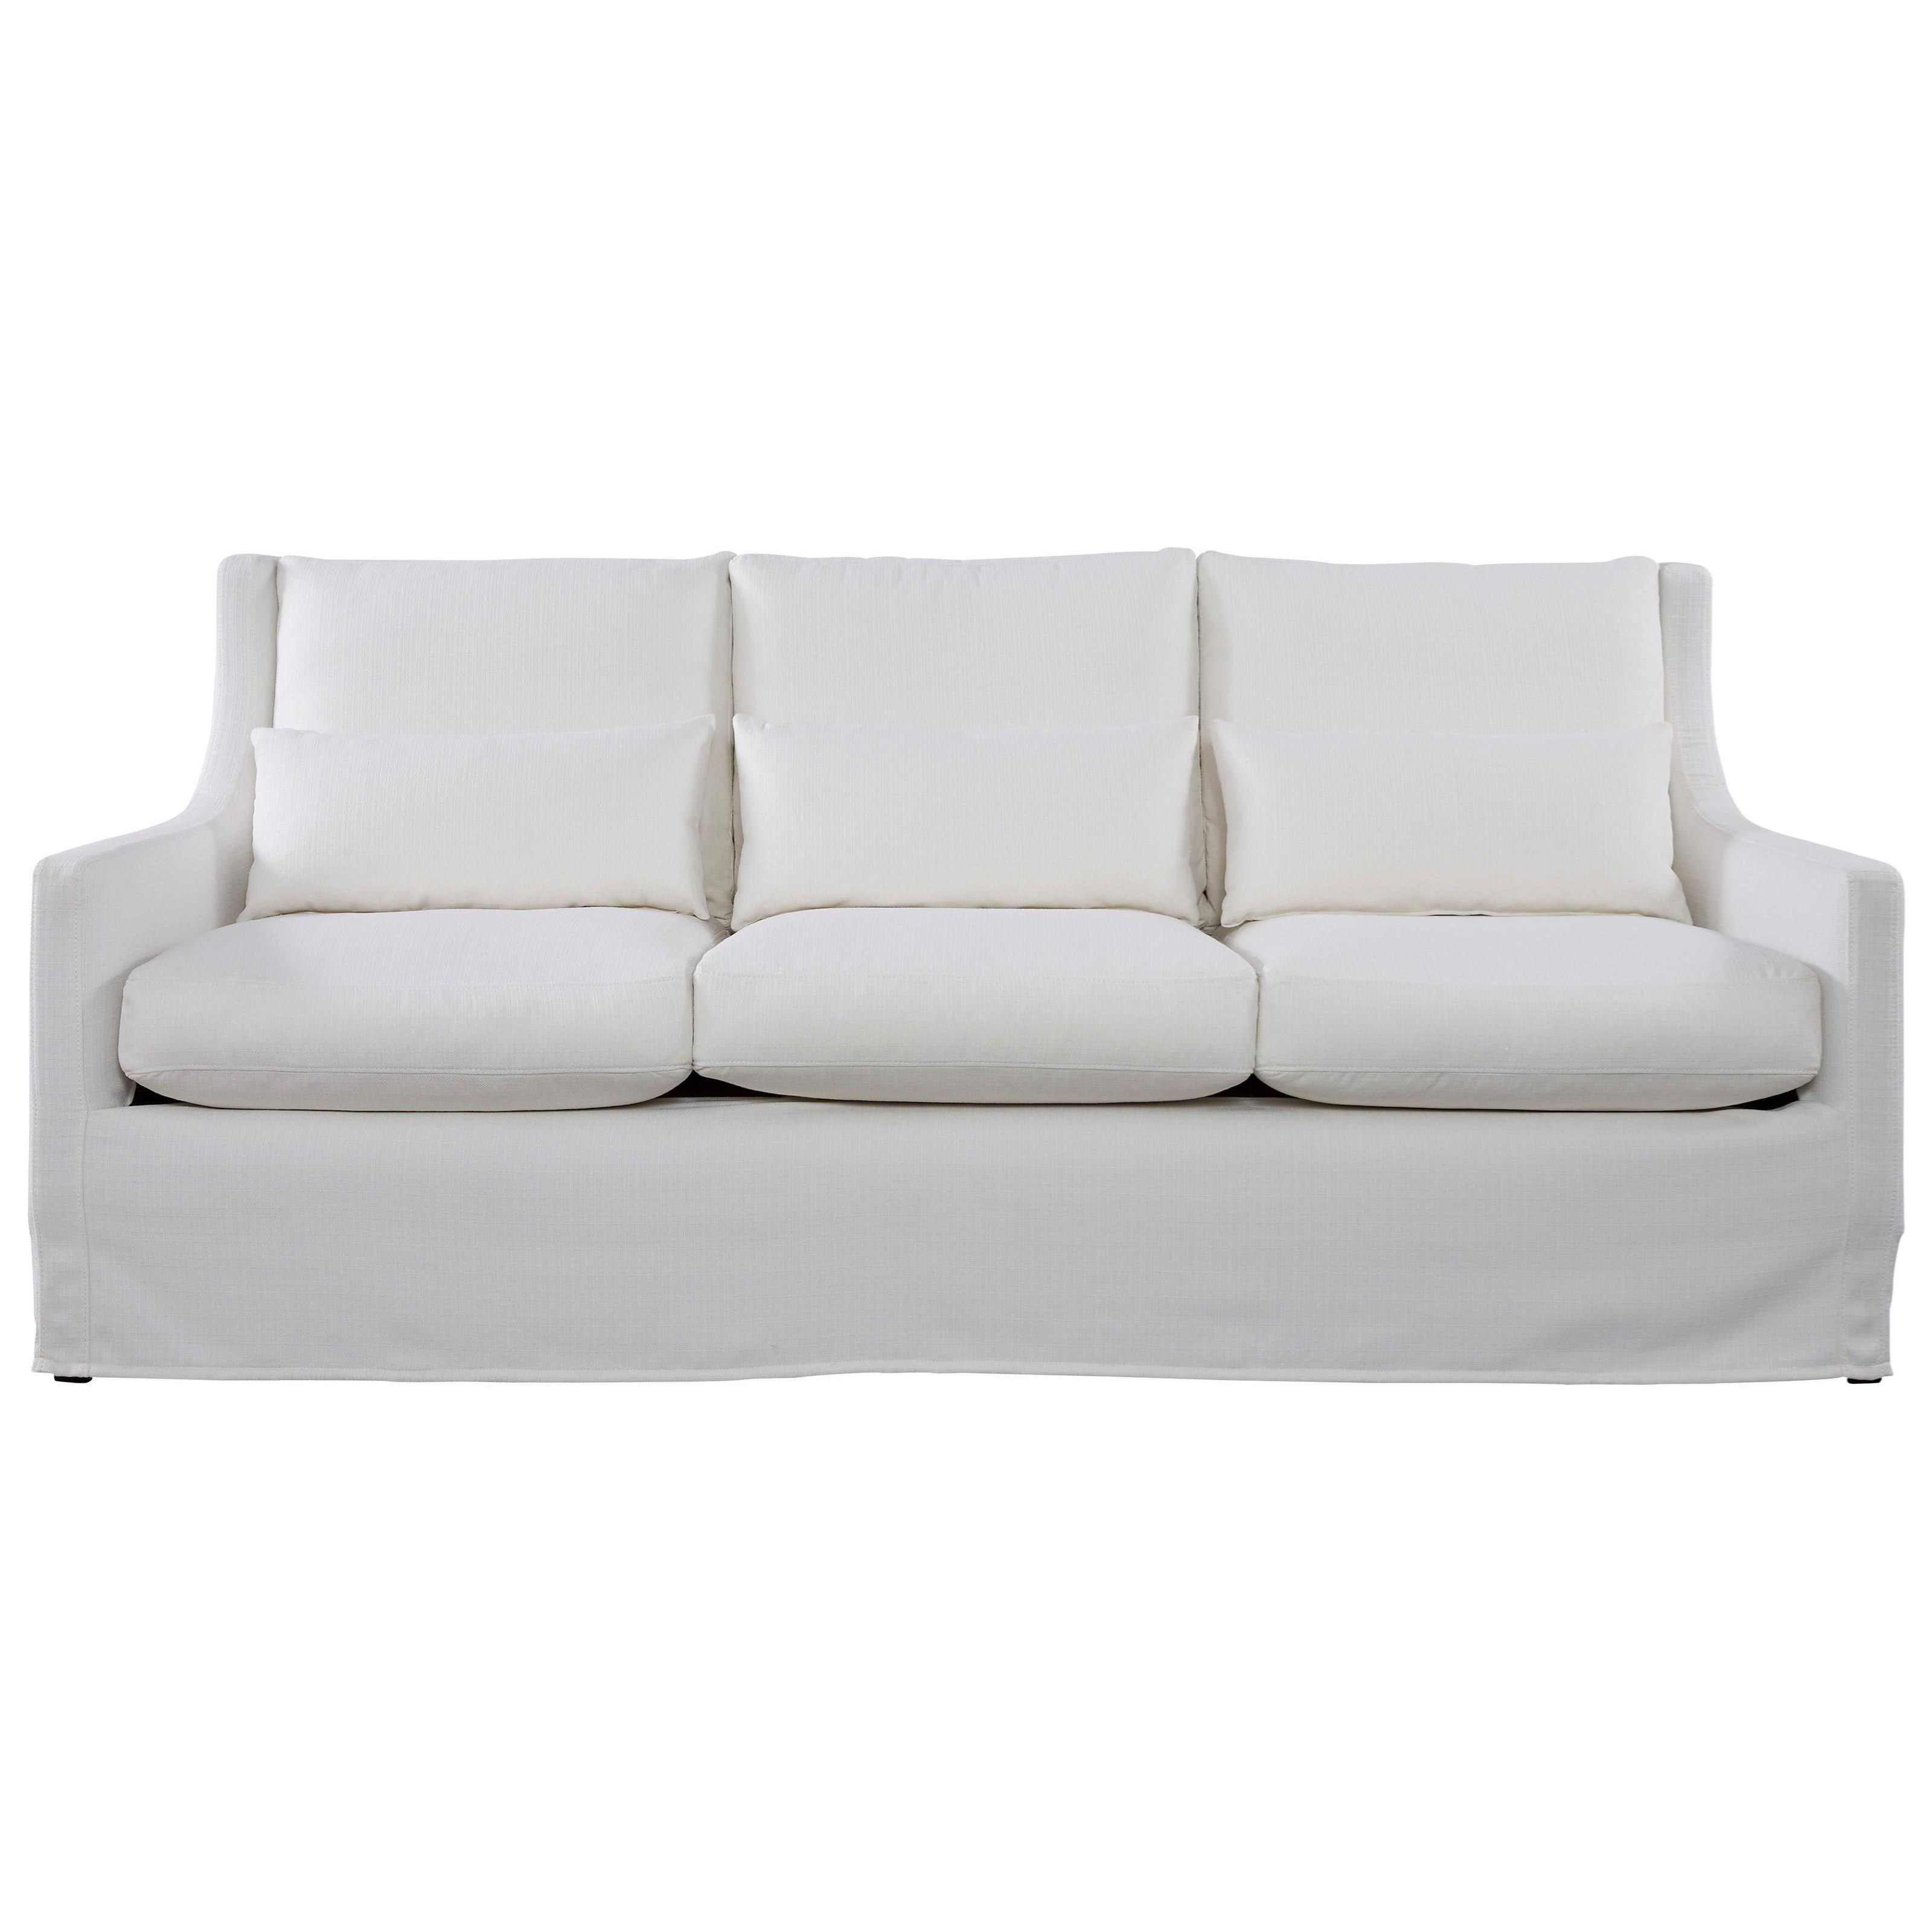 Sloane Sofa by Universal at Suburban Furniture